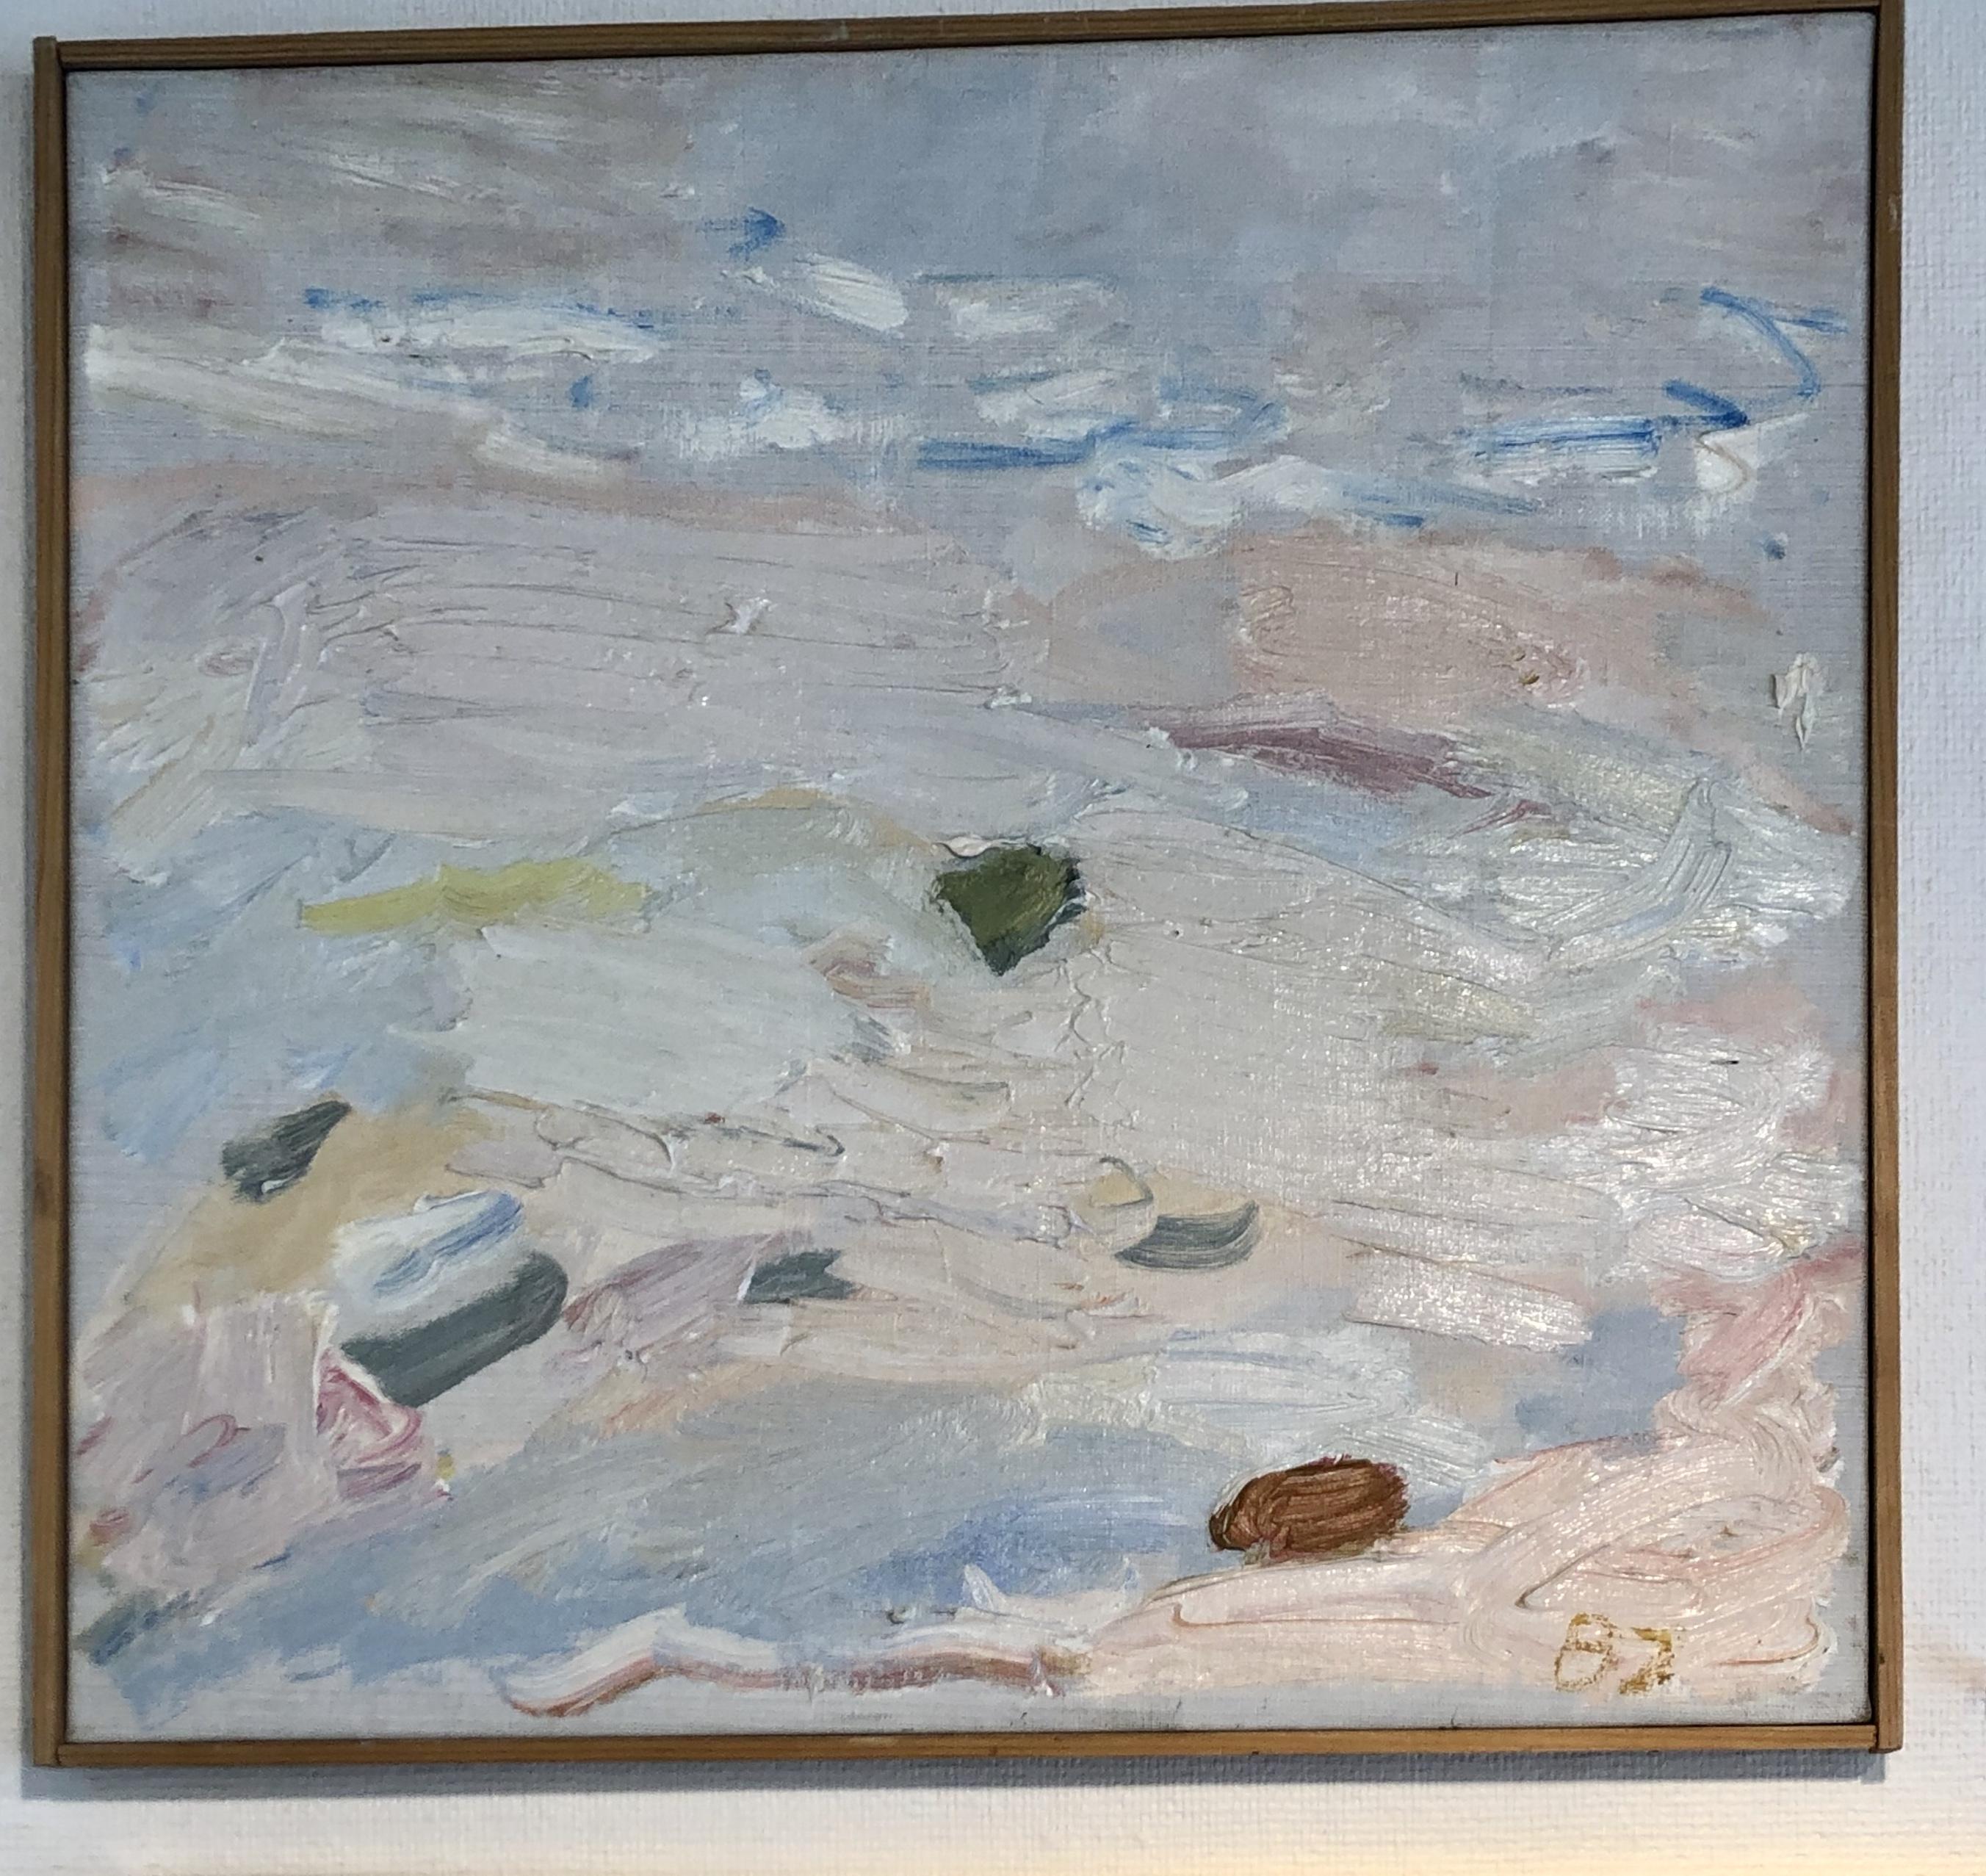 Bengt Johansson - Originalmålning 60x60 cm